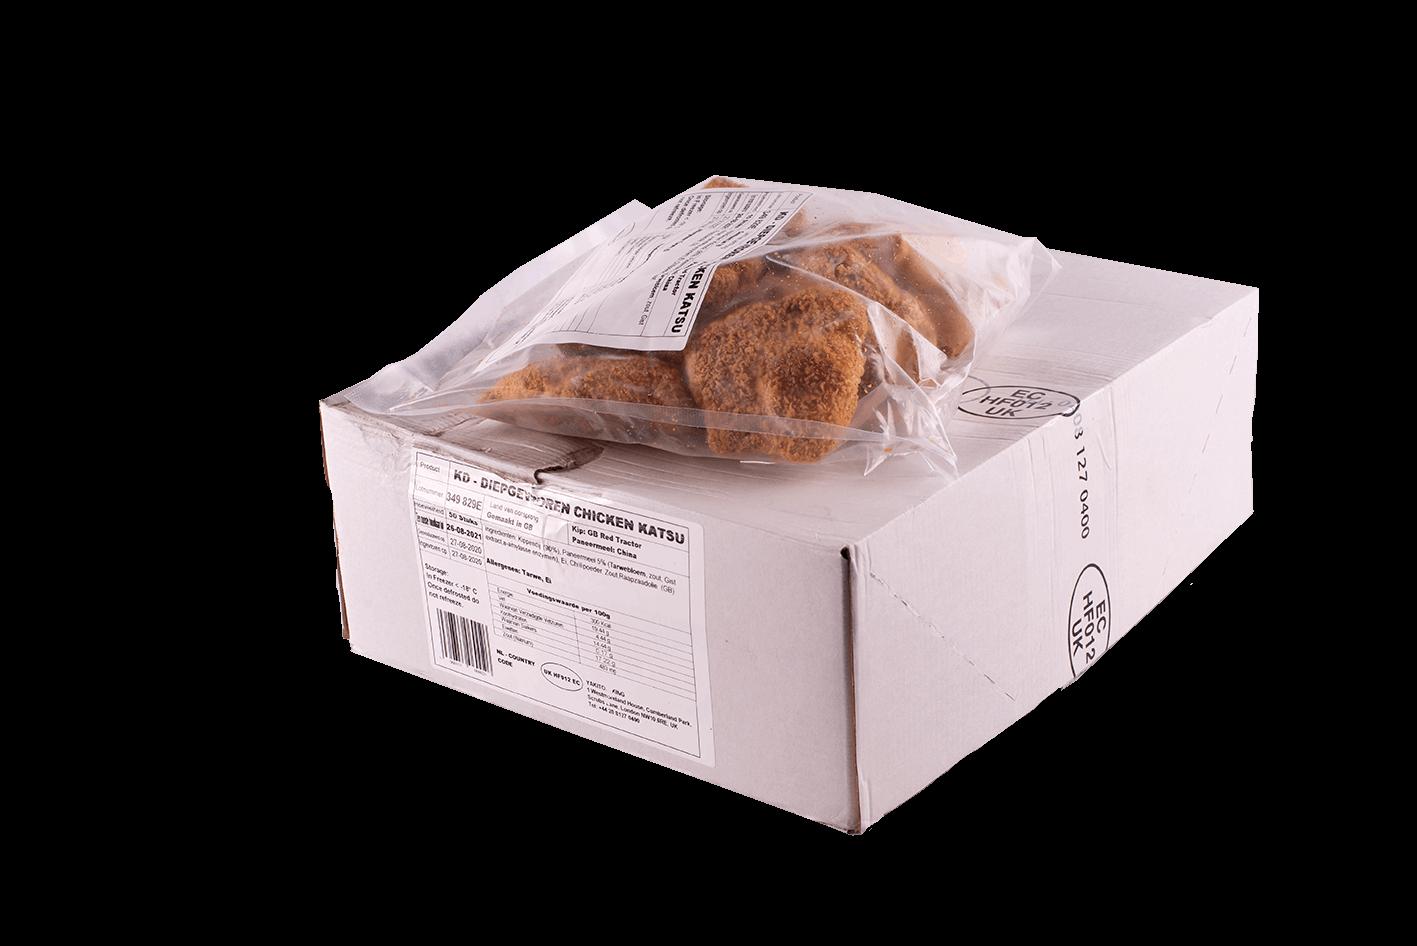 Productafbeelding DEEP FRIED CHICKEN KATSU BOX 50 PIECES